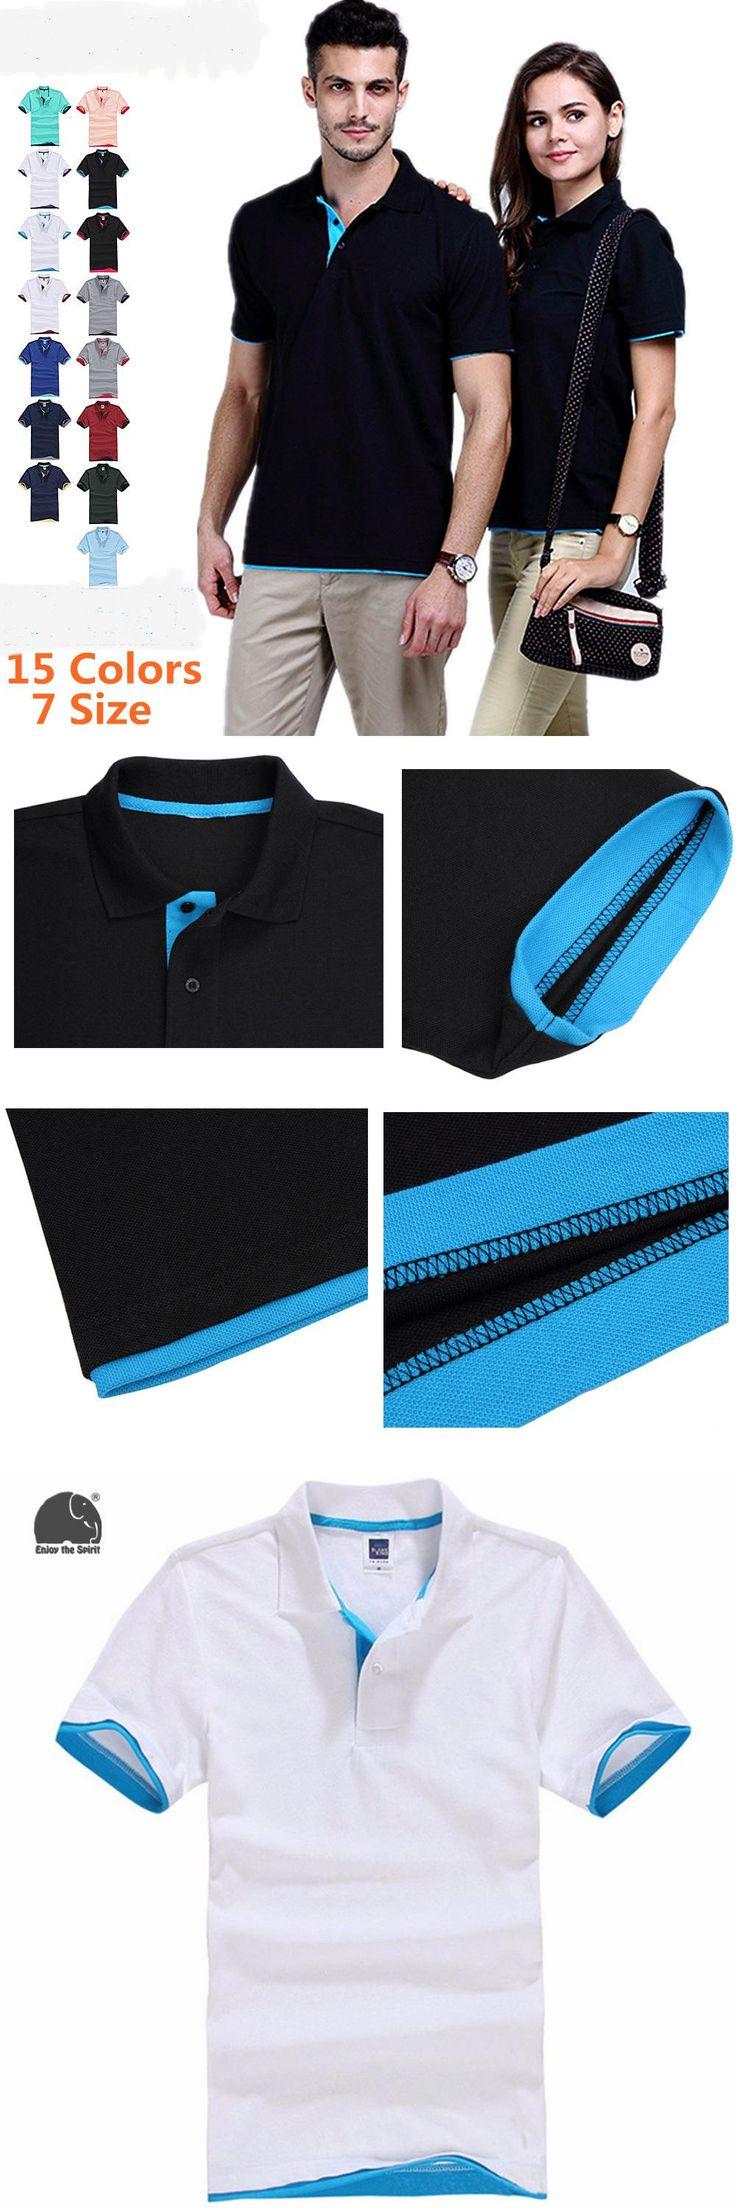 EnjoytheSpirit Brand Clothing New Men Polo Shirt Men Business & Casual Solid Male Polo Shirt Short Sleeve White Polo Shirt